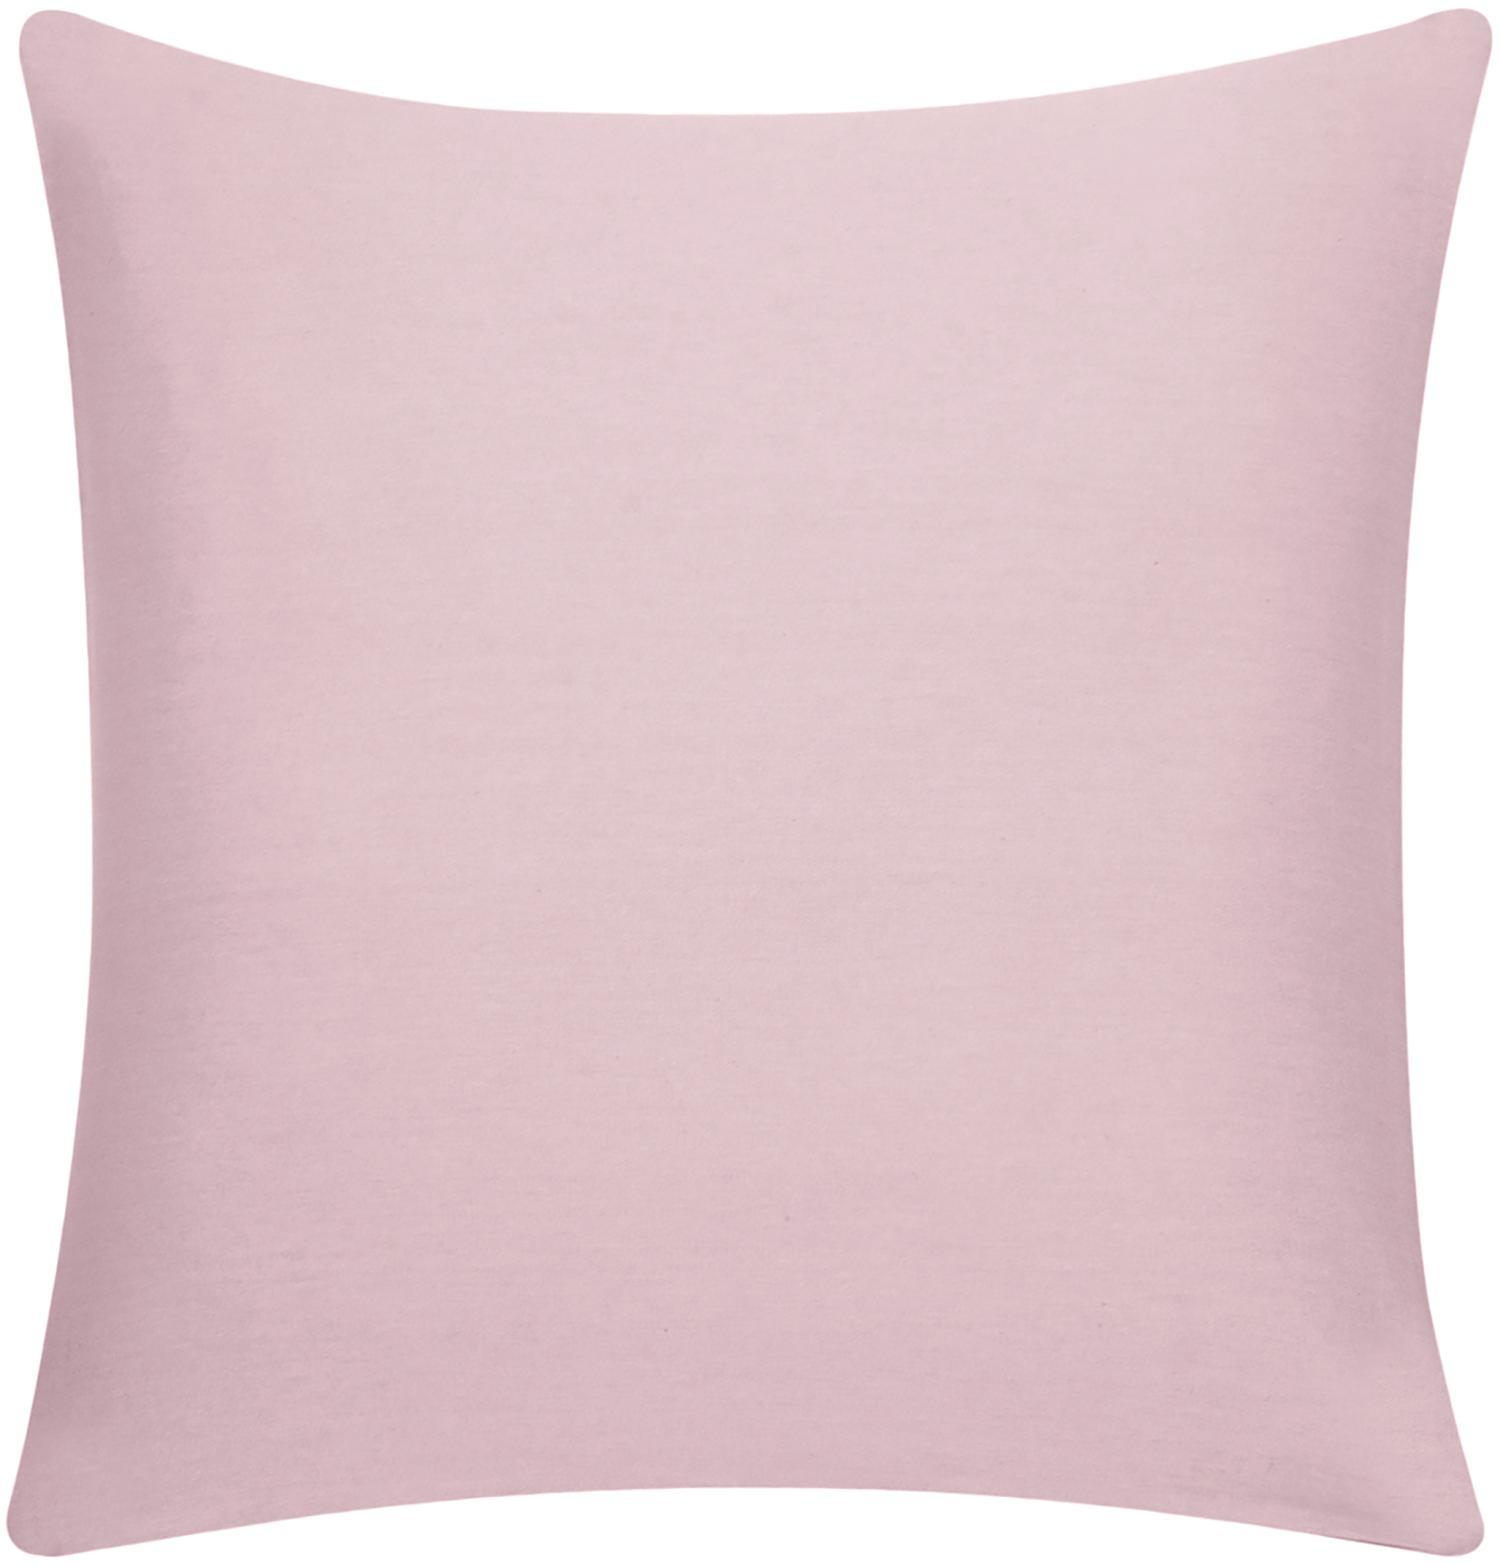 Federa arredo in cotone rosa Mads, Cotone, Rosa, Larg. 50 x Lung. 50 cm